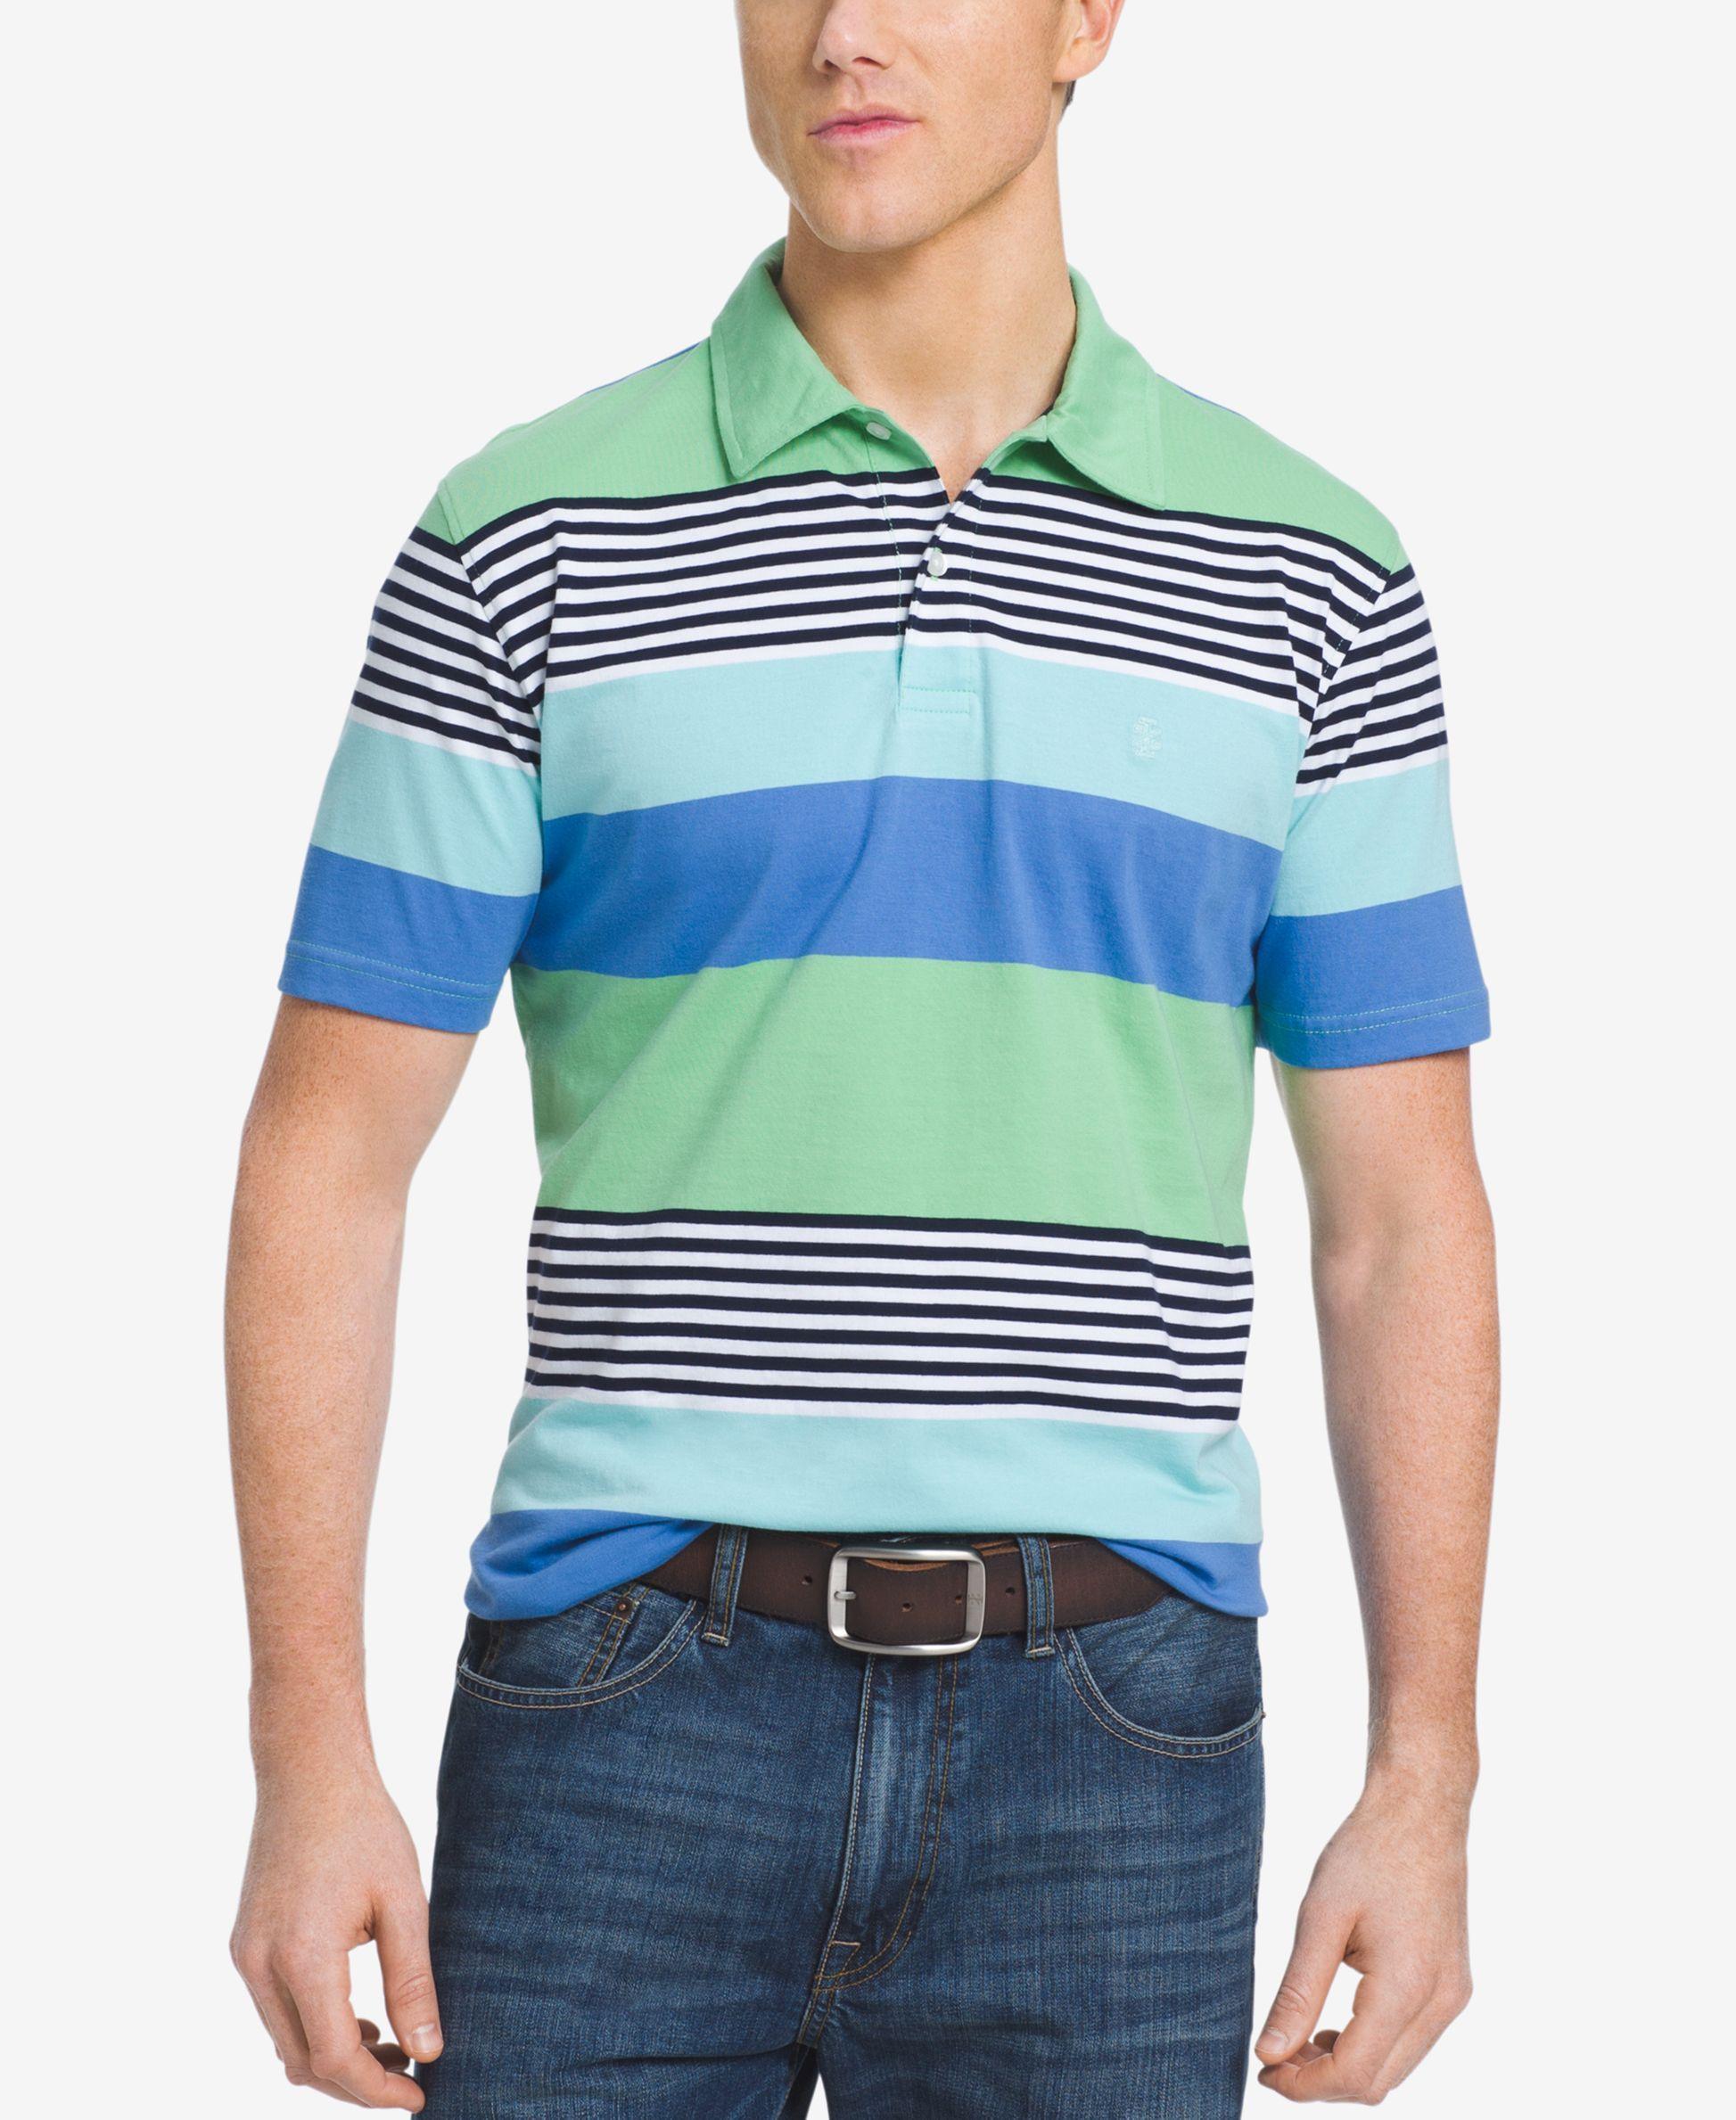 Izod Polo Shirts Amazon